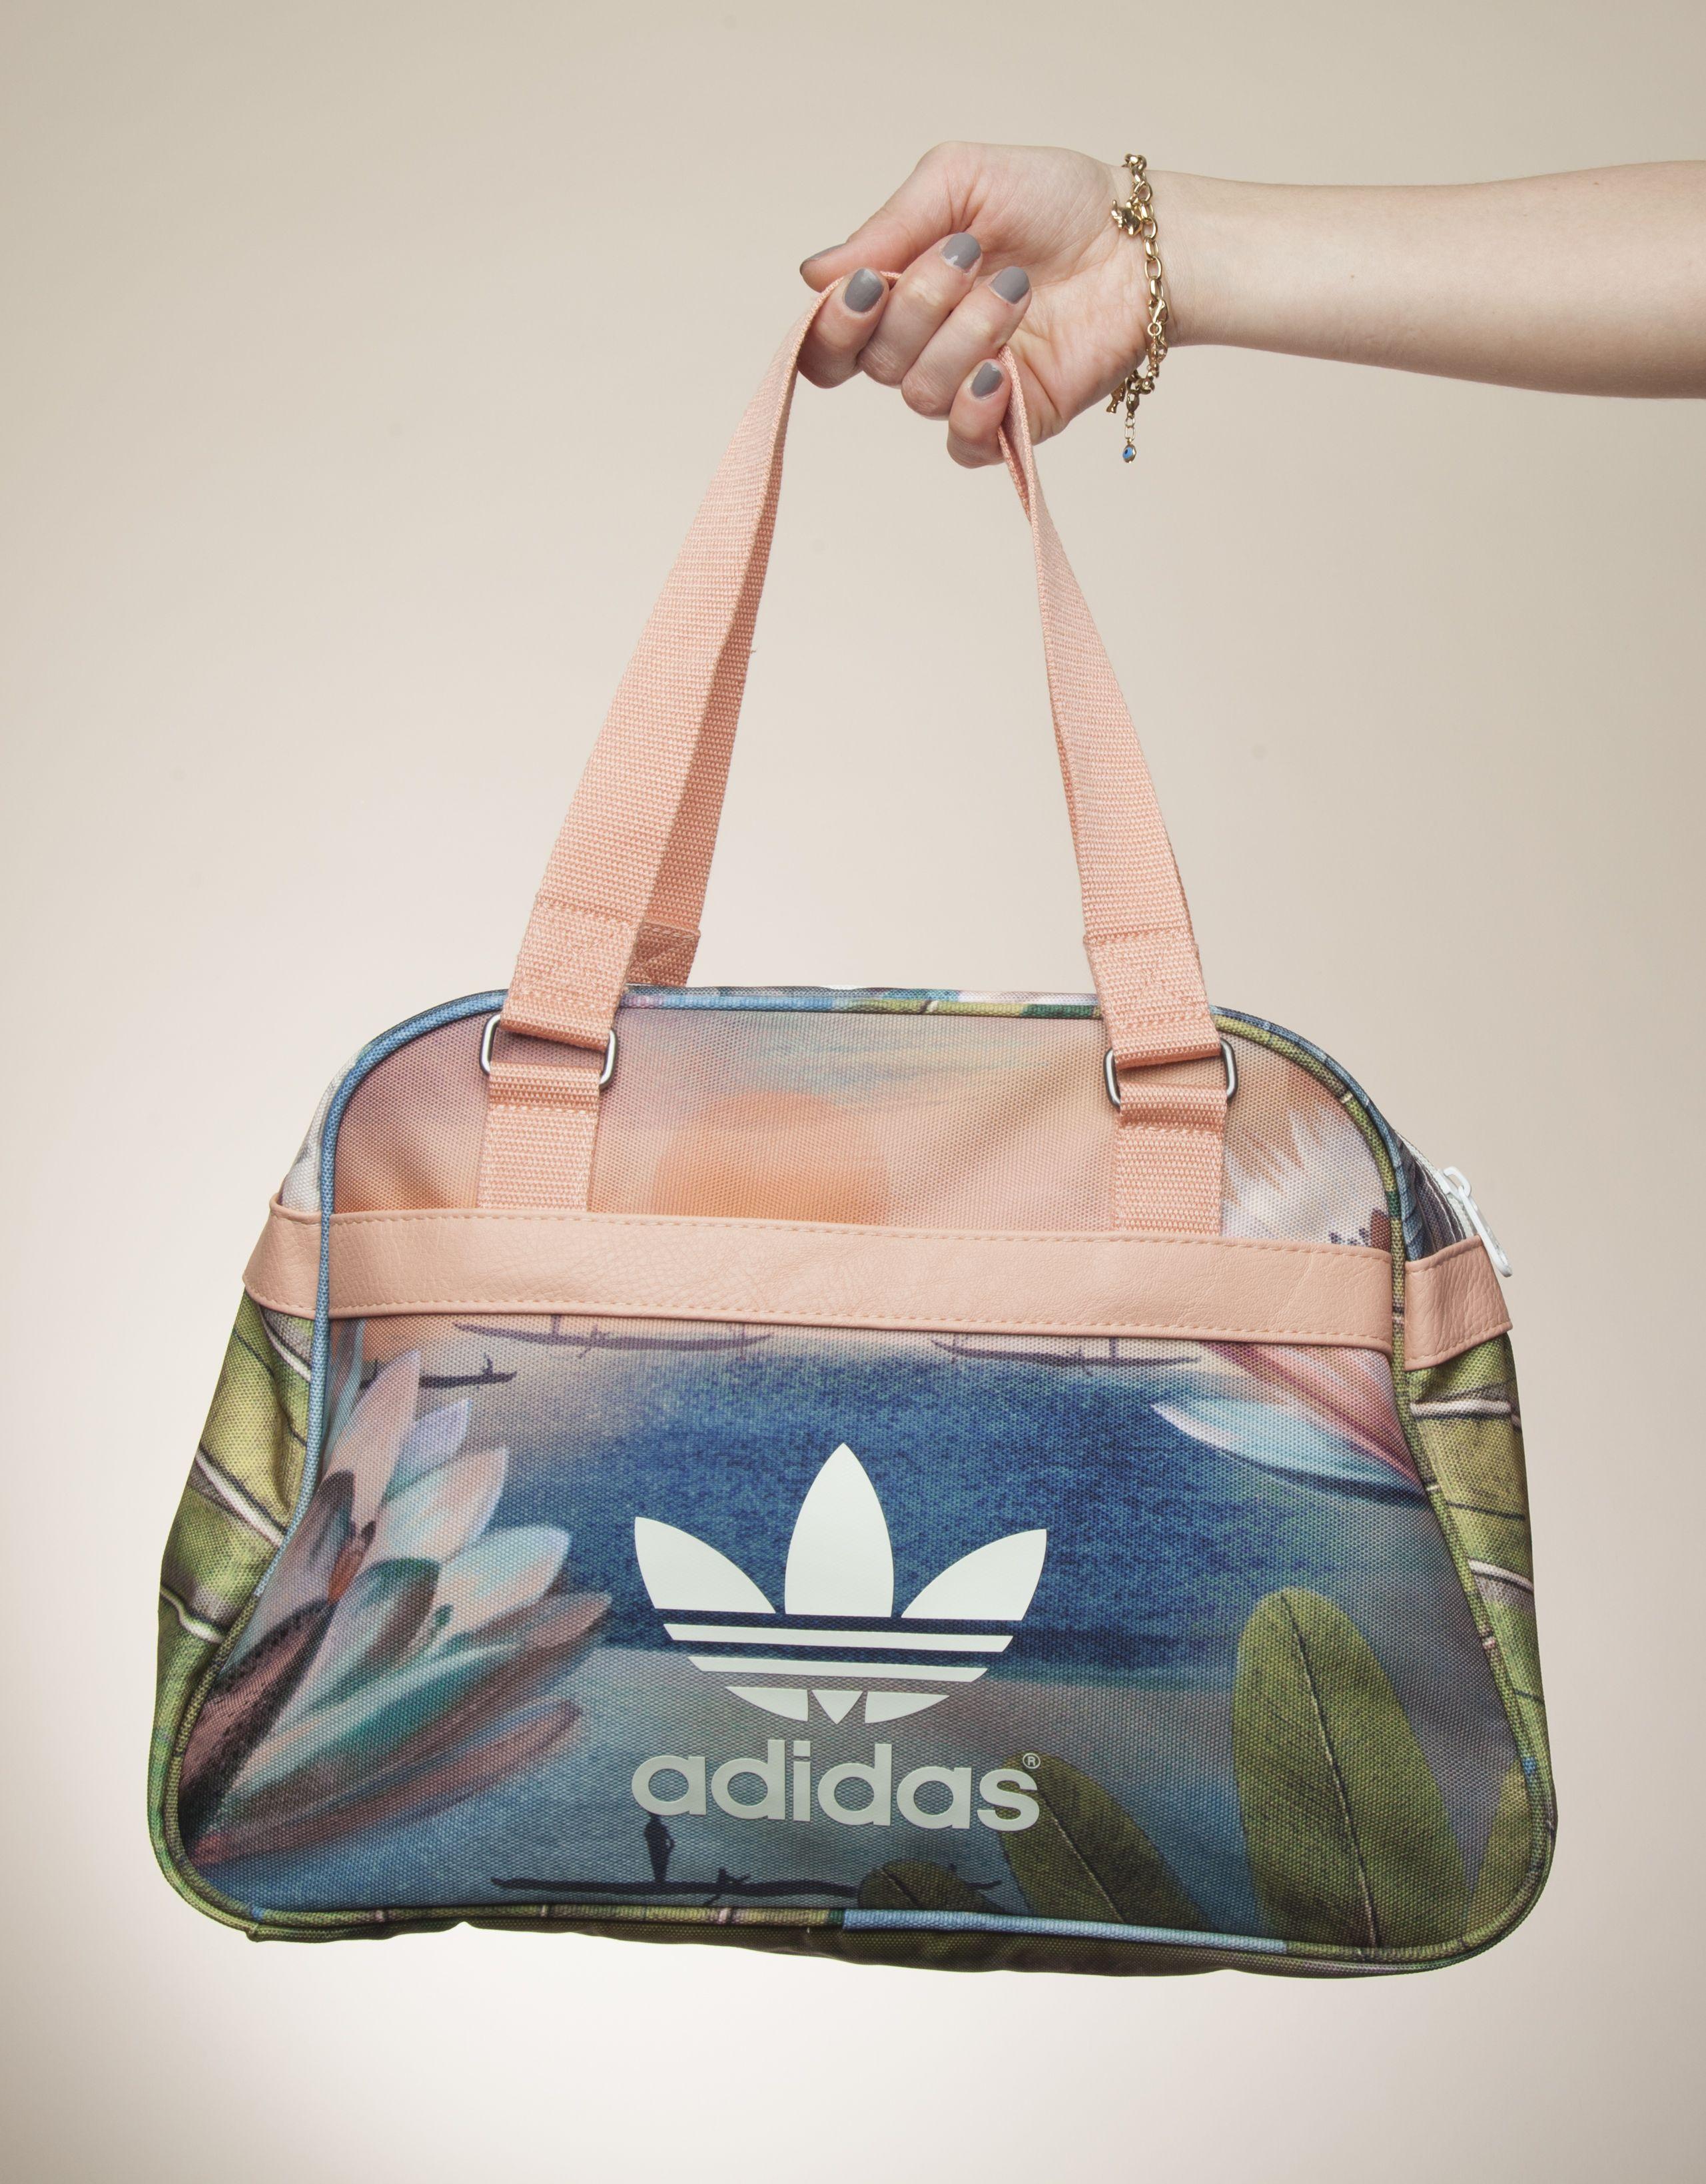 adidas trainer bag